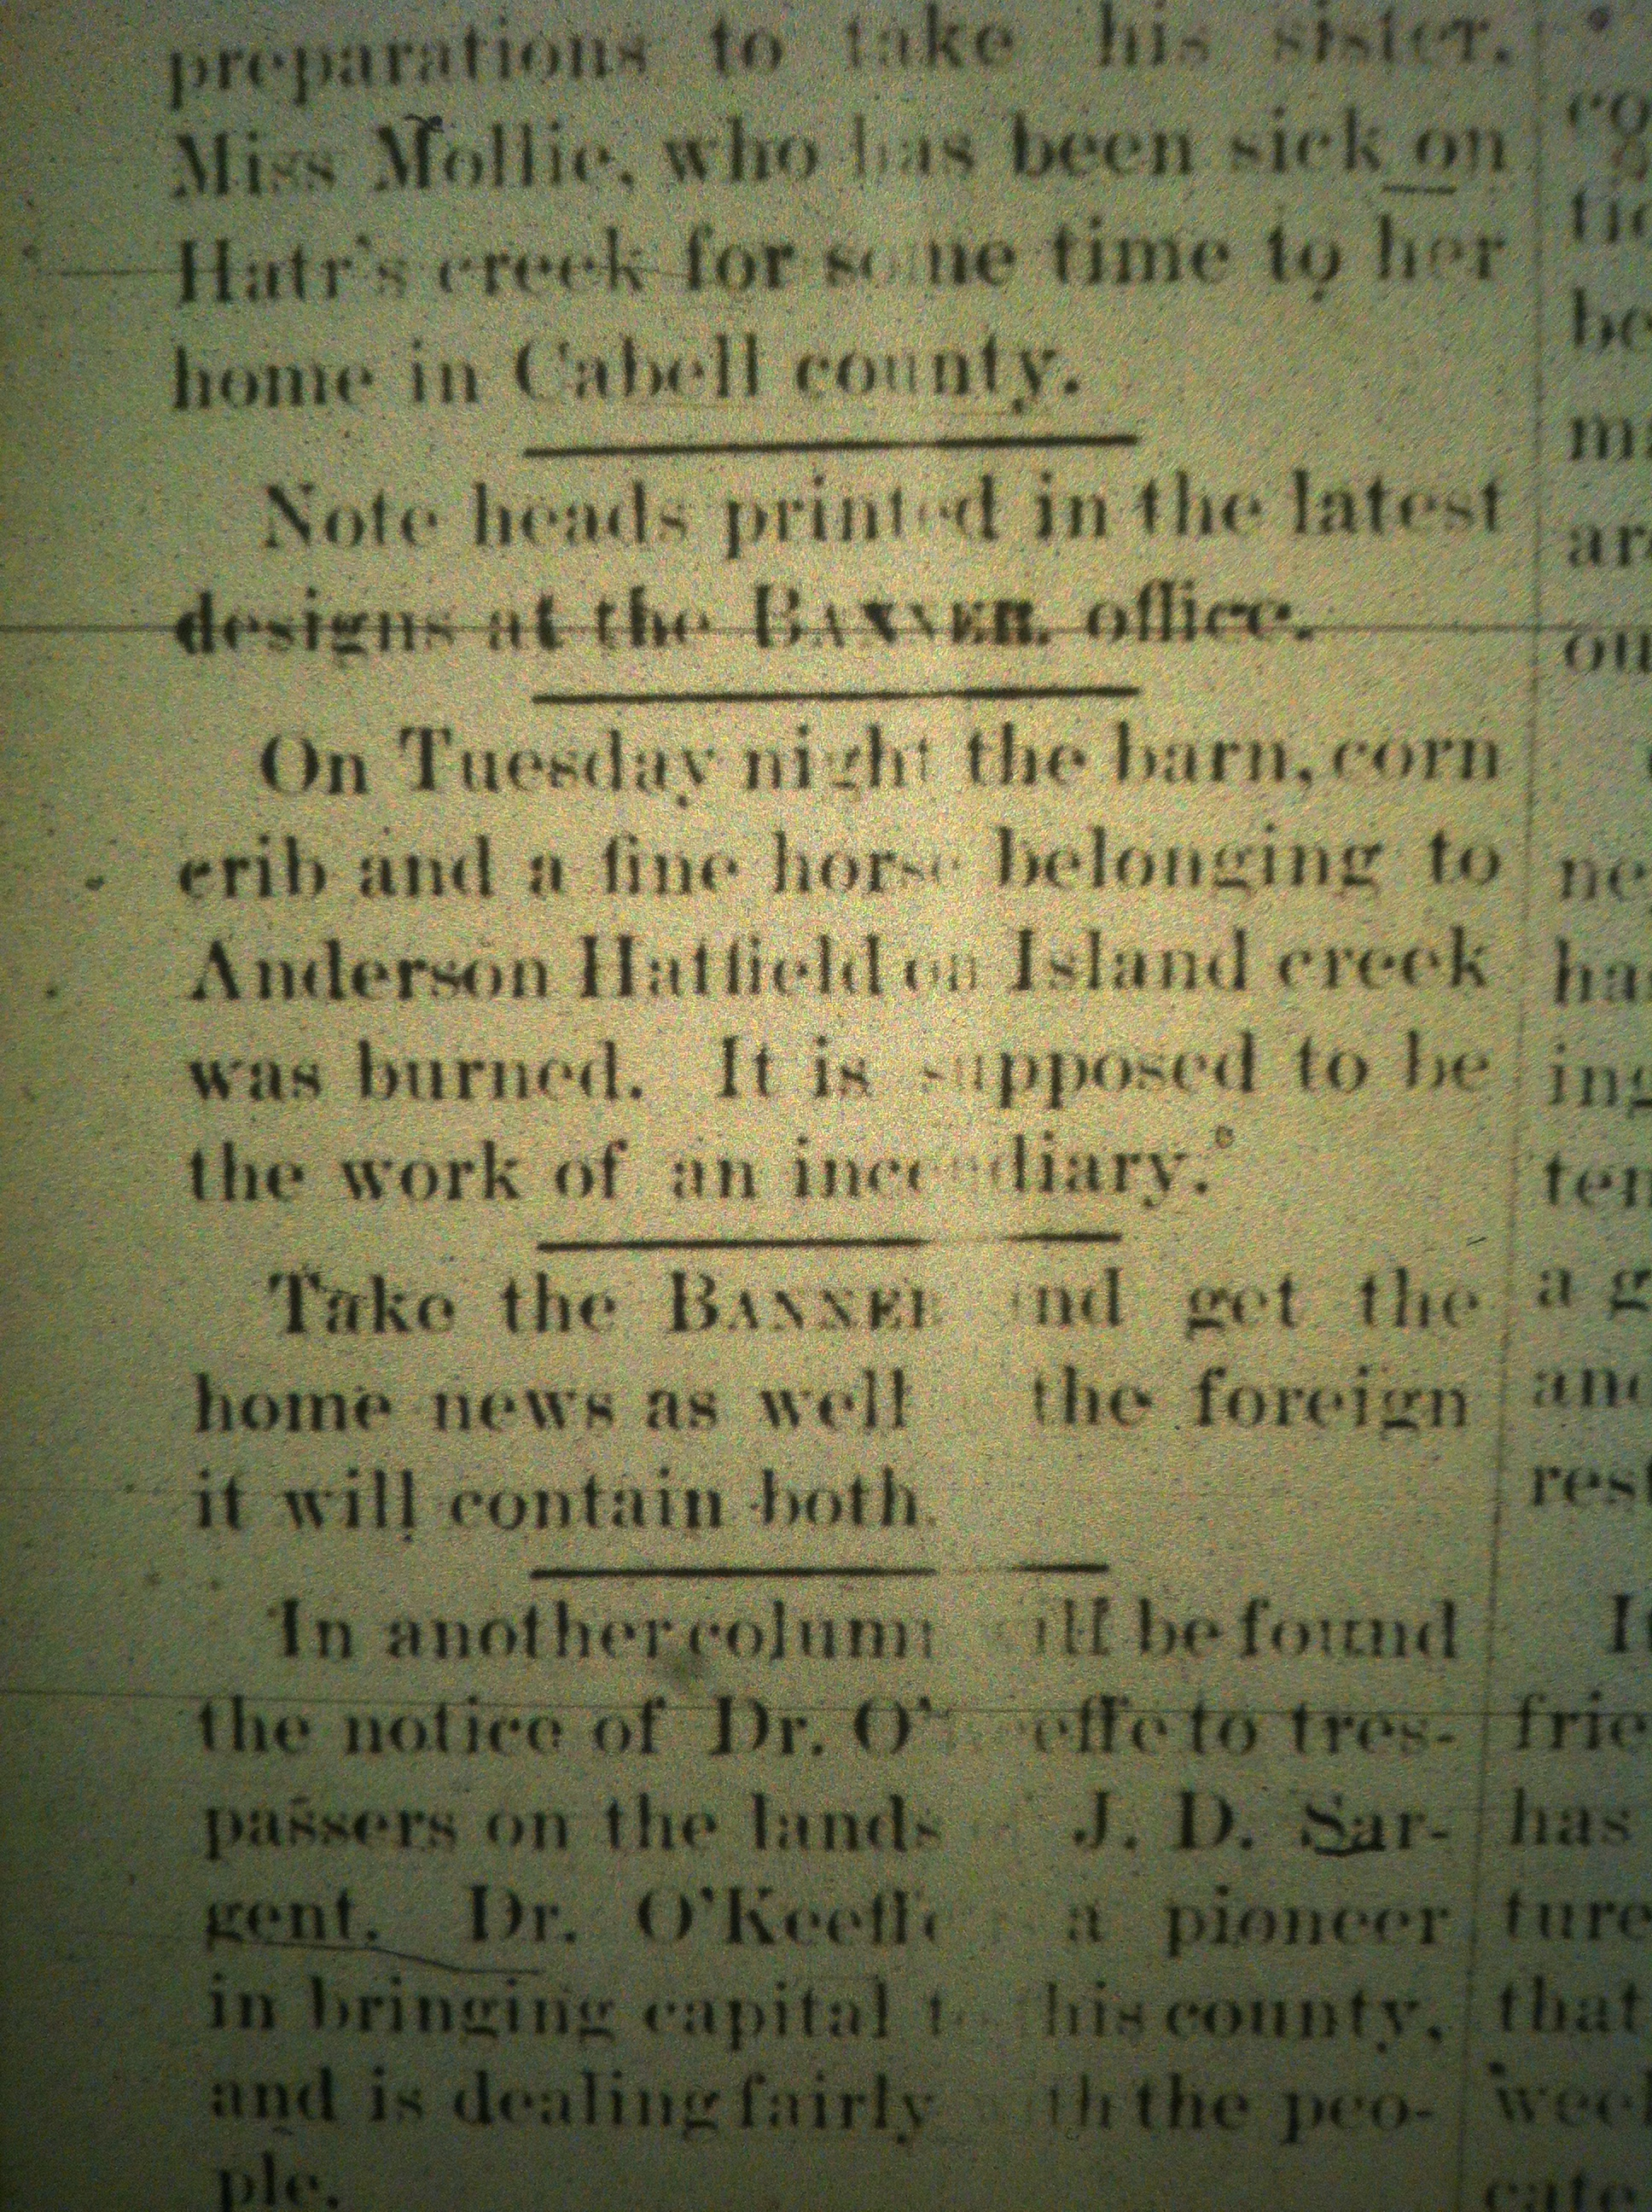 Anse Hatfield Barn LCB 03.28.1889.JPG